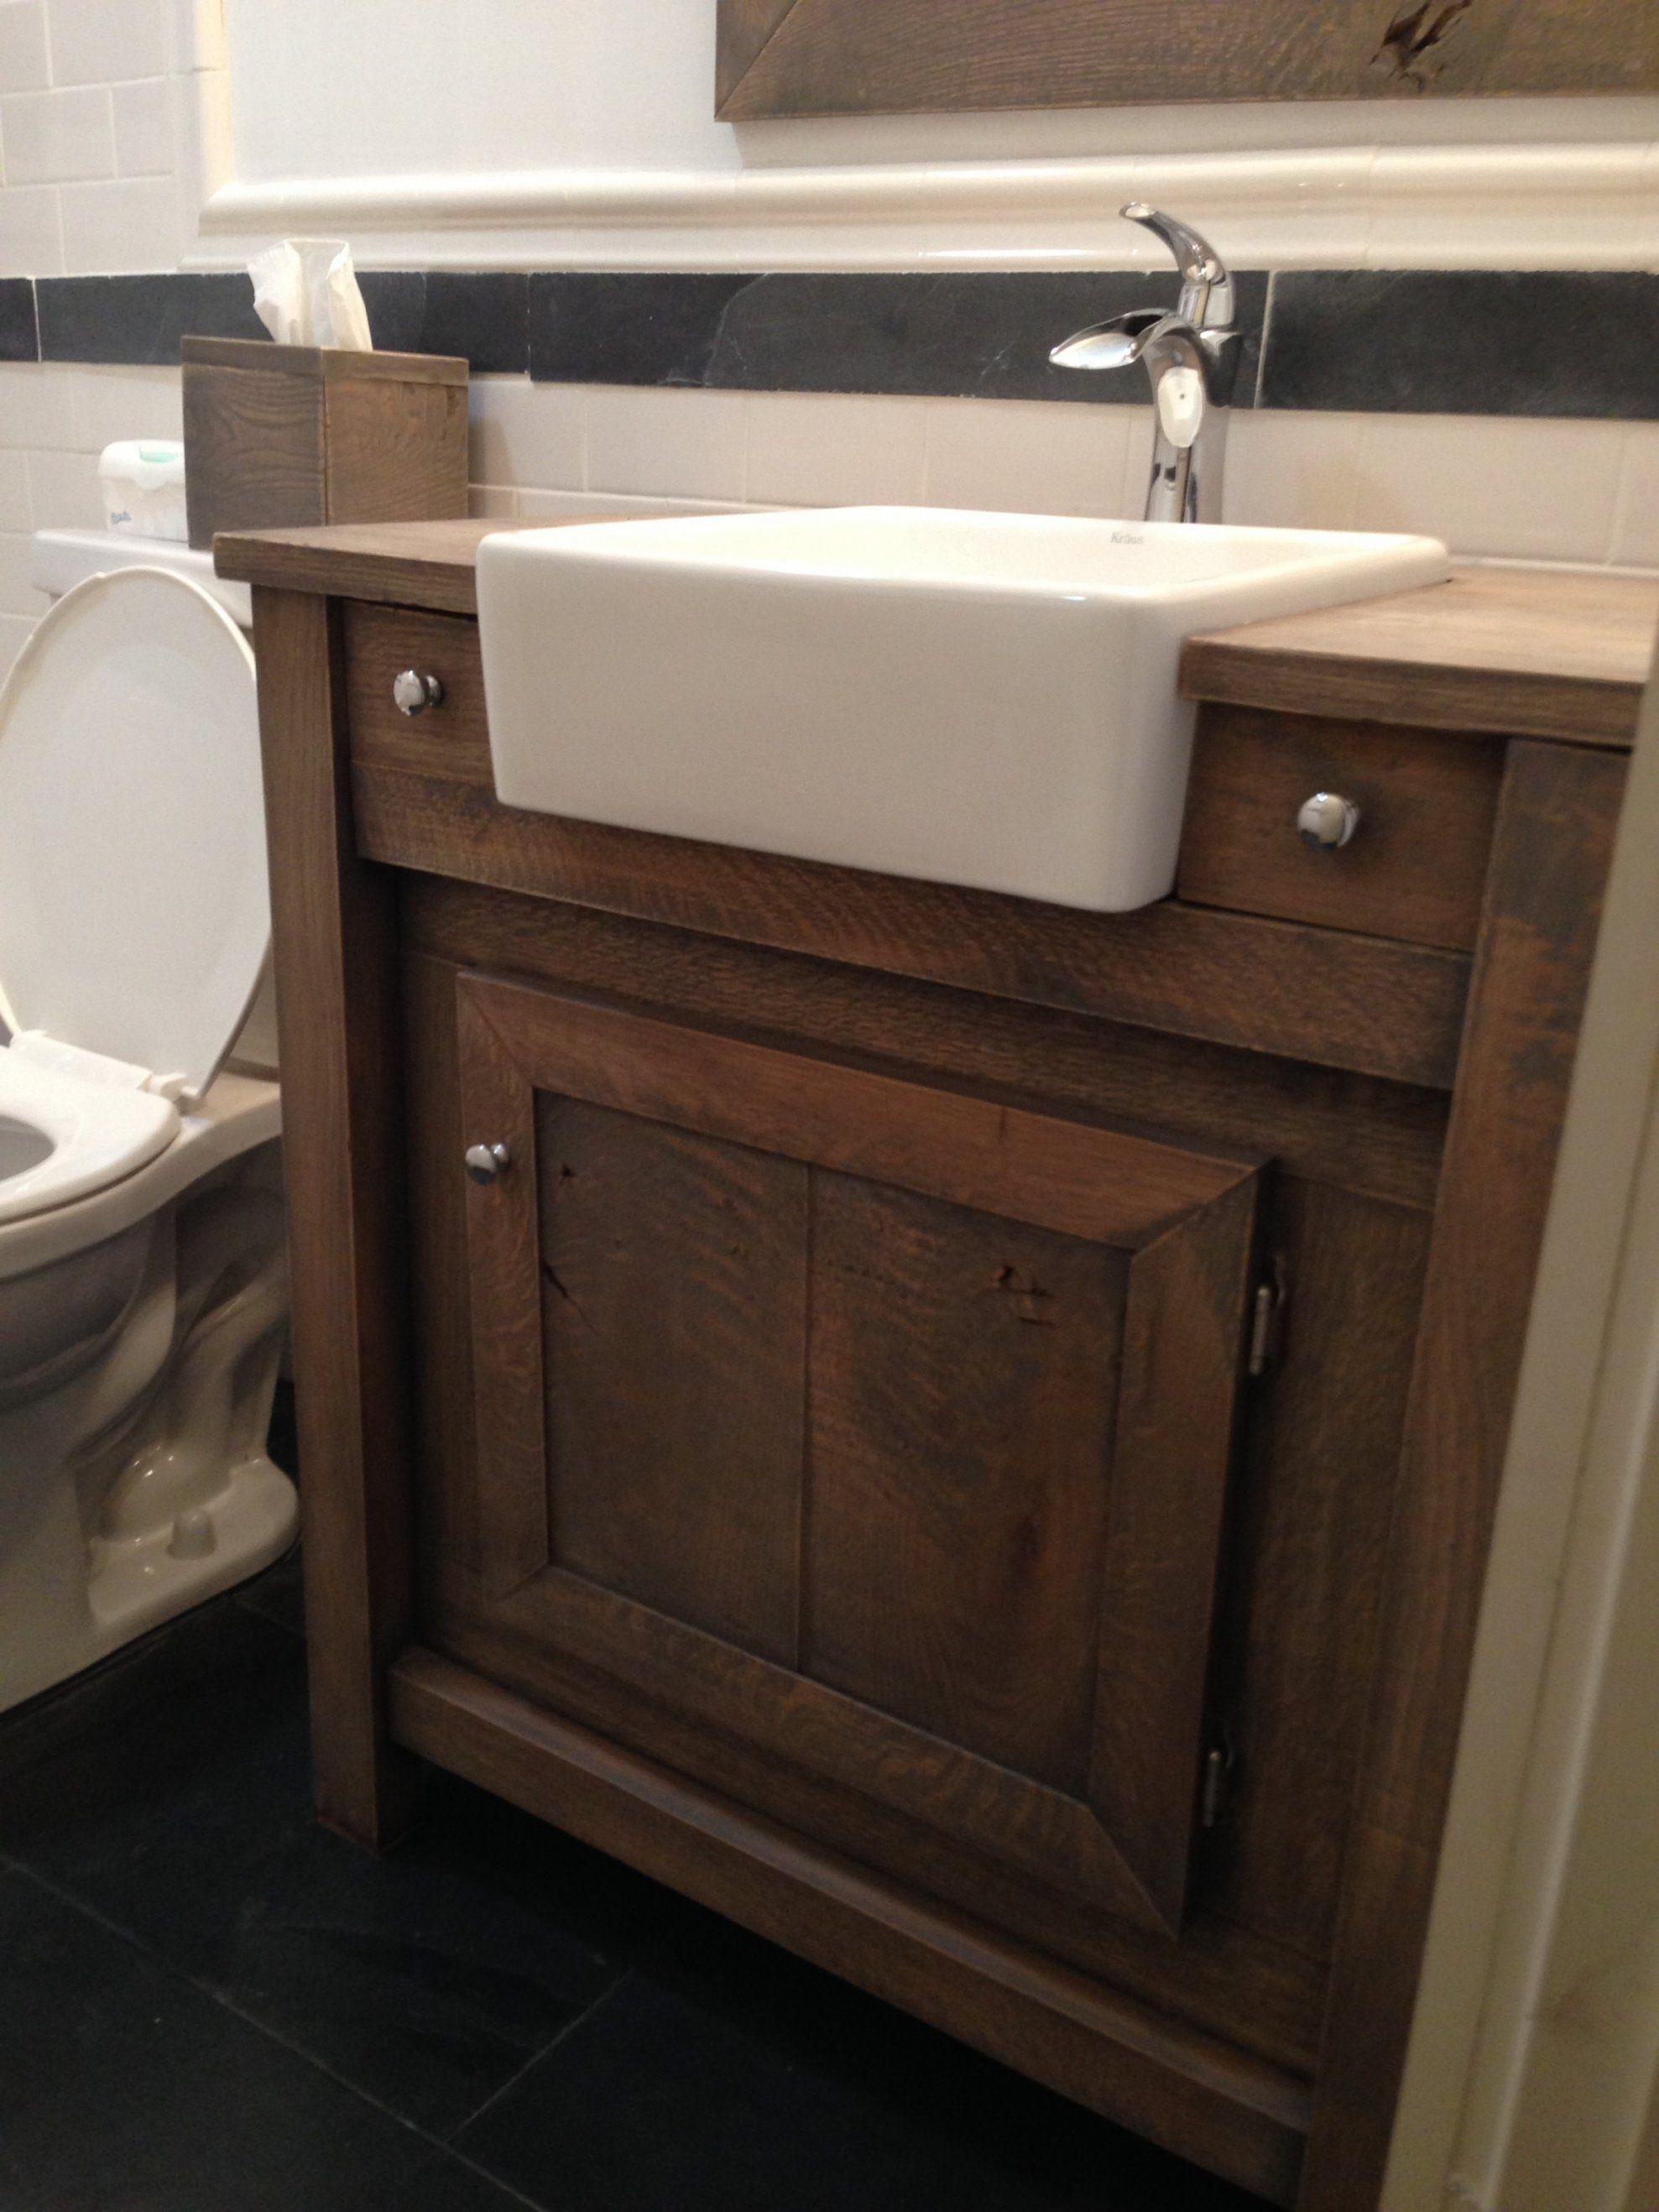 Farm Sink Bathroom Vanity Laredo With Farmhouse For Sale 10 With